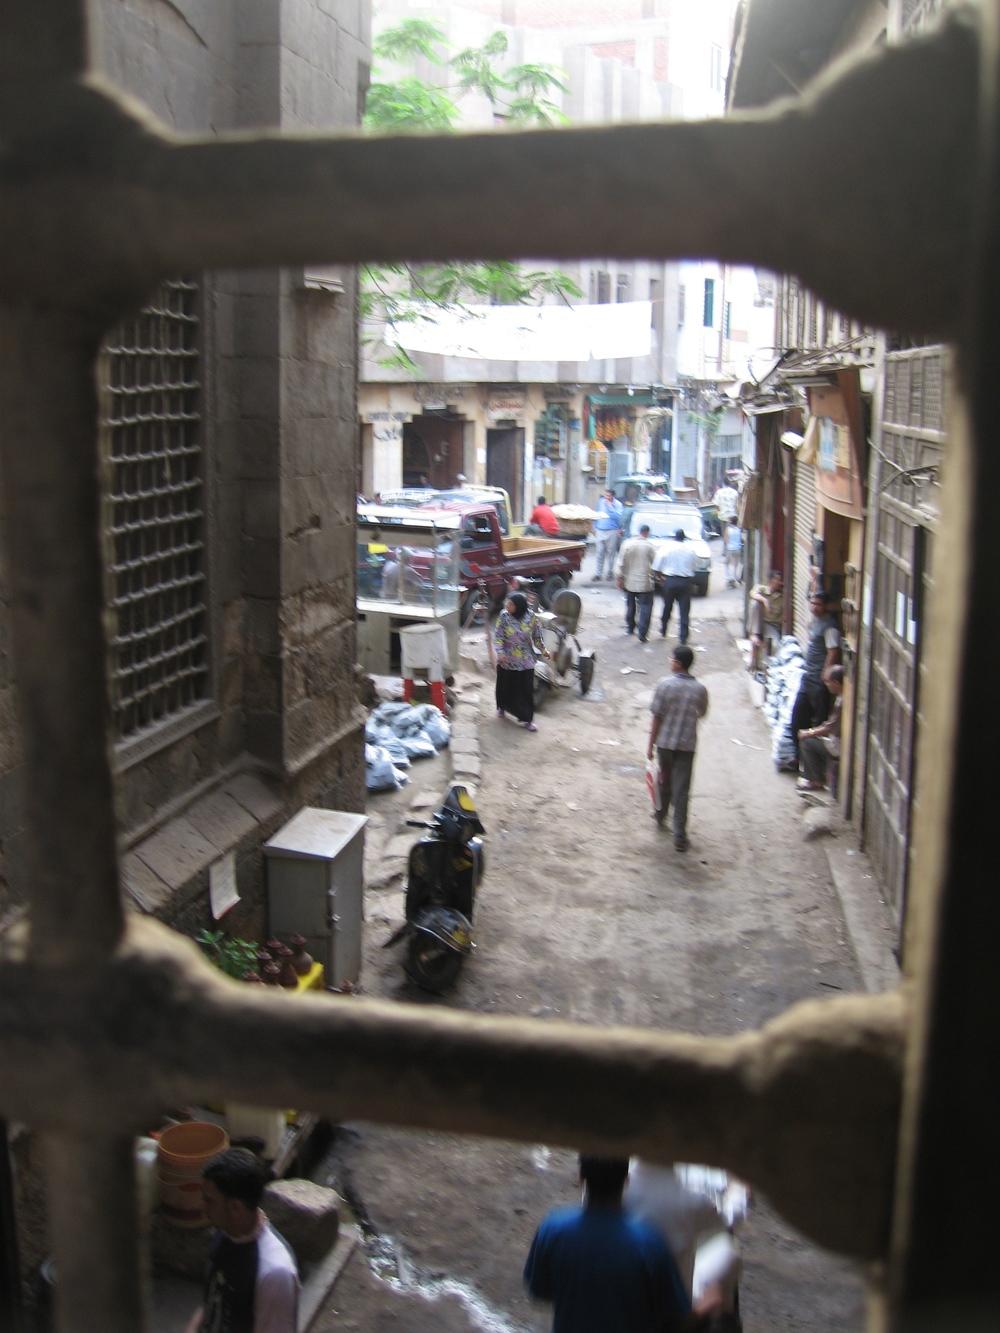 Darb al-Ahmar, Cairo. ©Elliott Colla (2005)